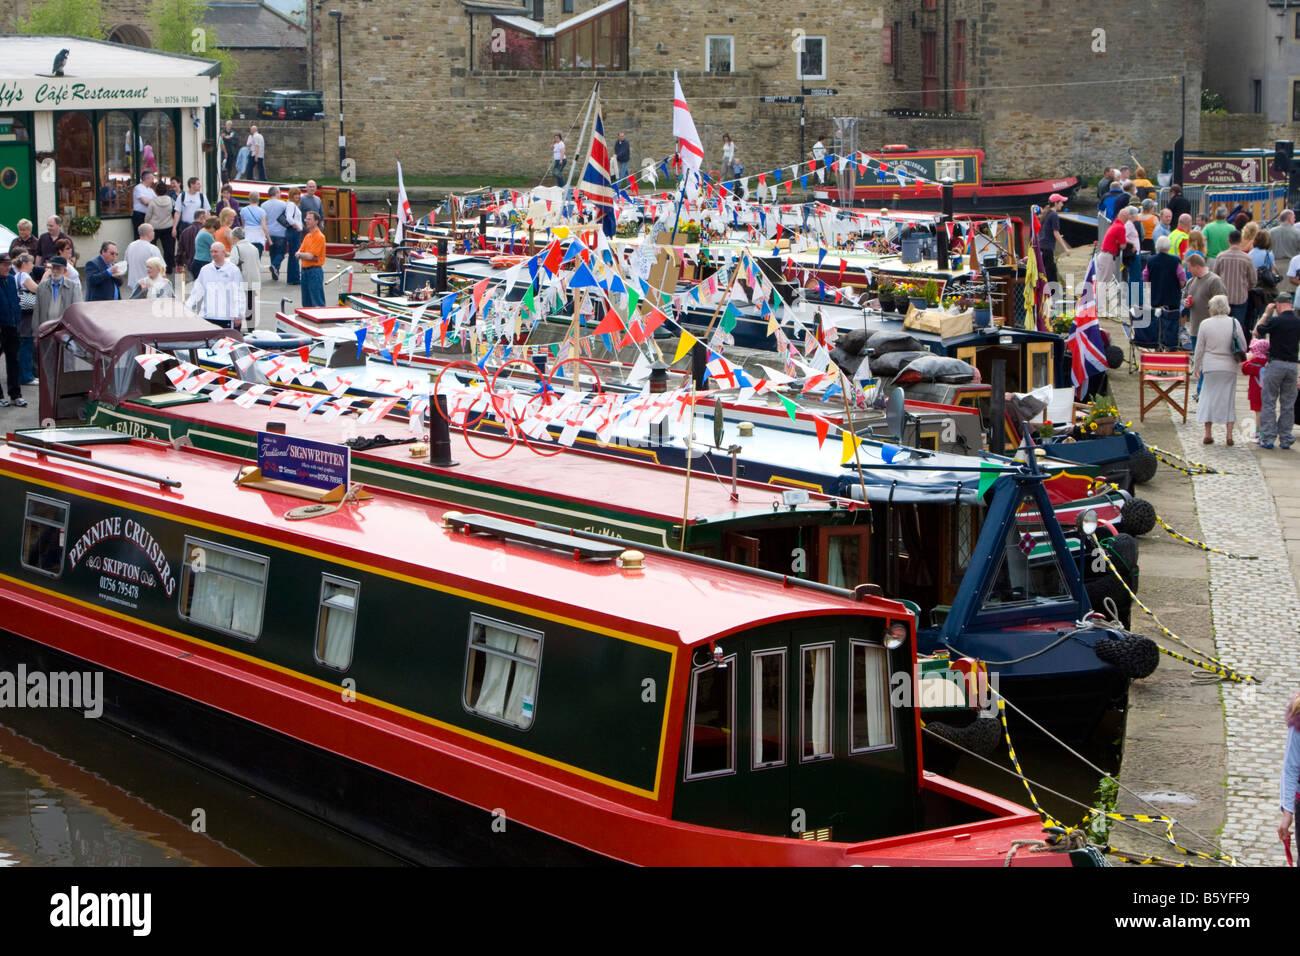 Narrow boats at Skipton Waterways Festival UK - Stock Image